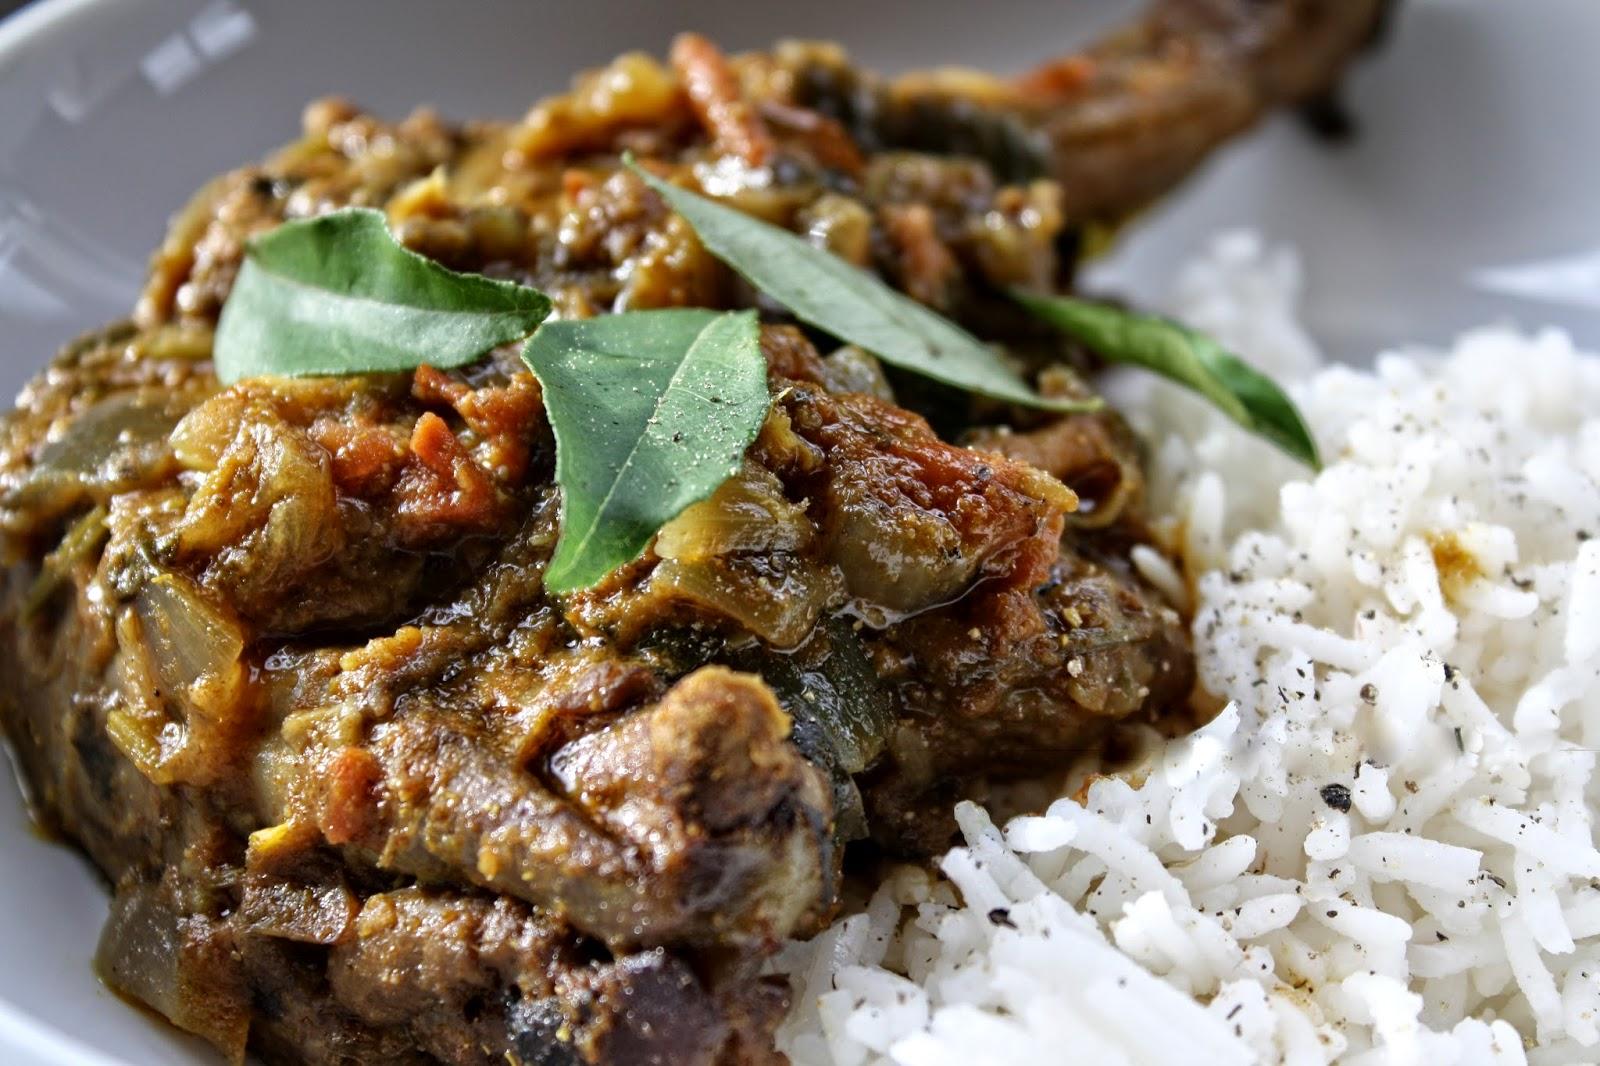 Humbling Eats- cook healthy homemade food